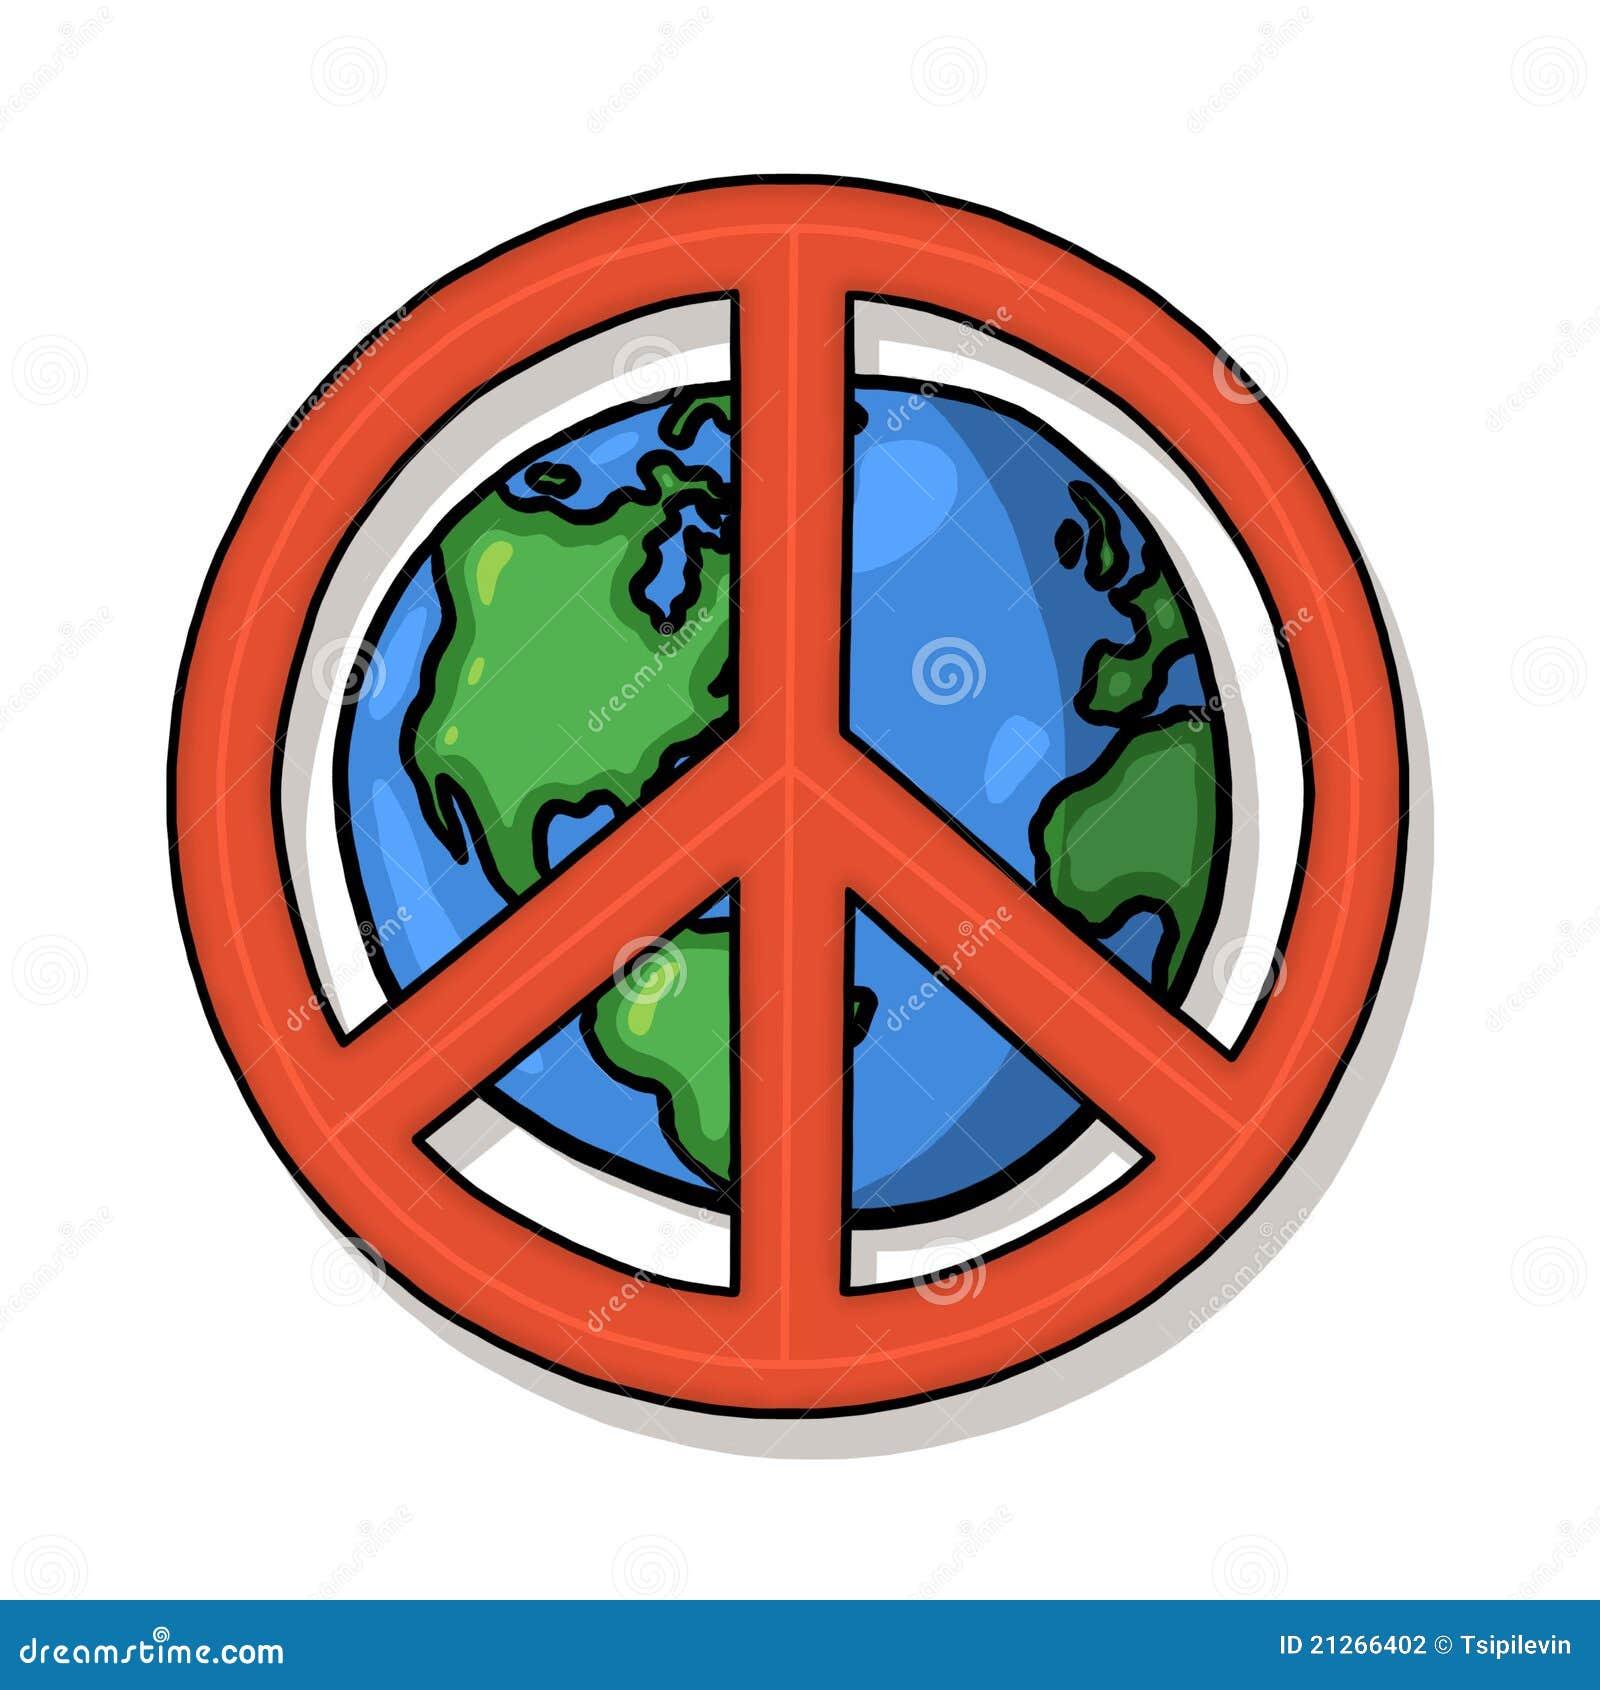 World peace symbol stock illustration illustration of world world peace symbol buycottarizona Gallery